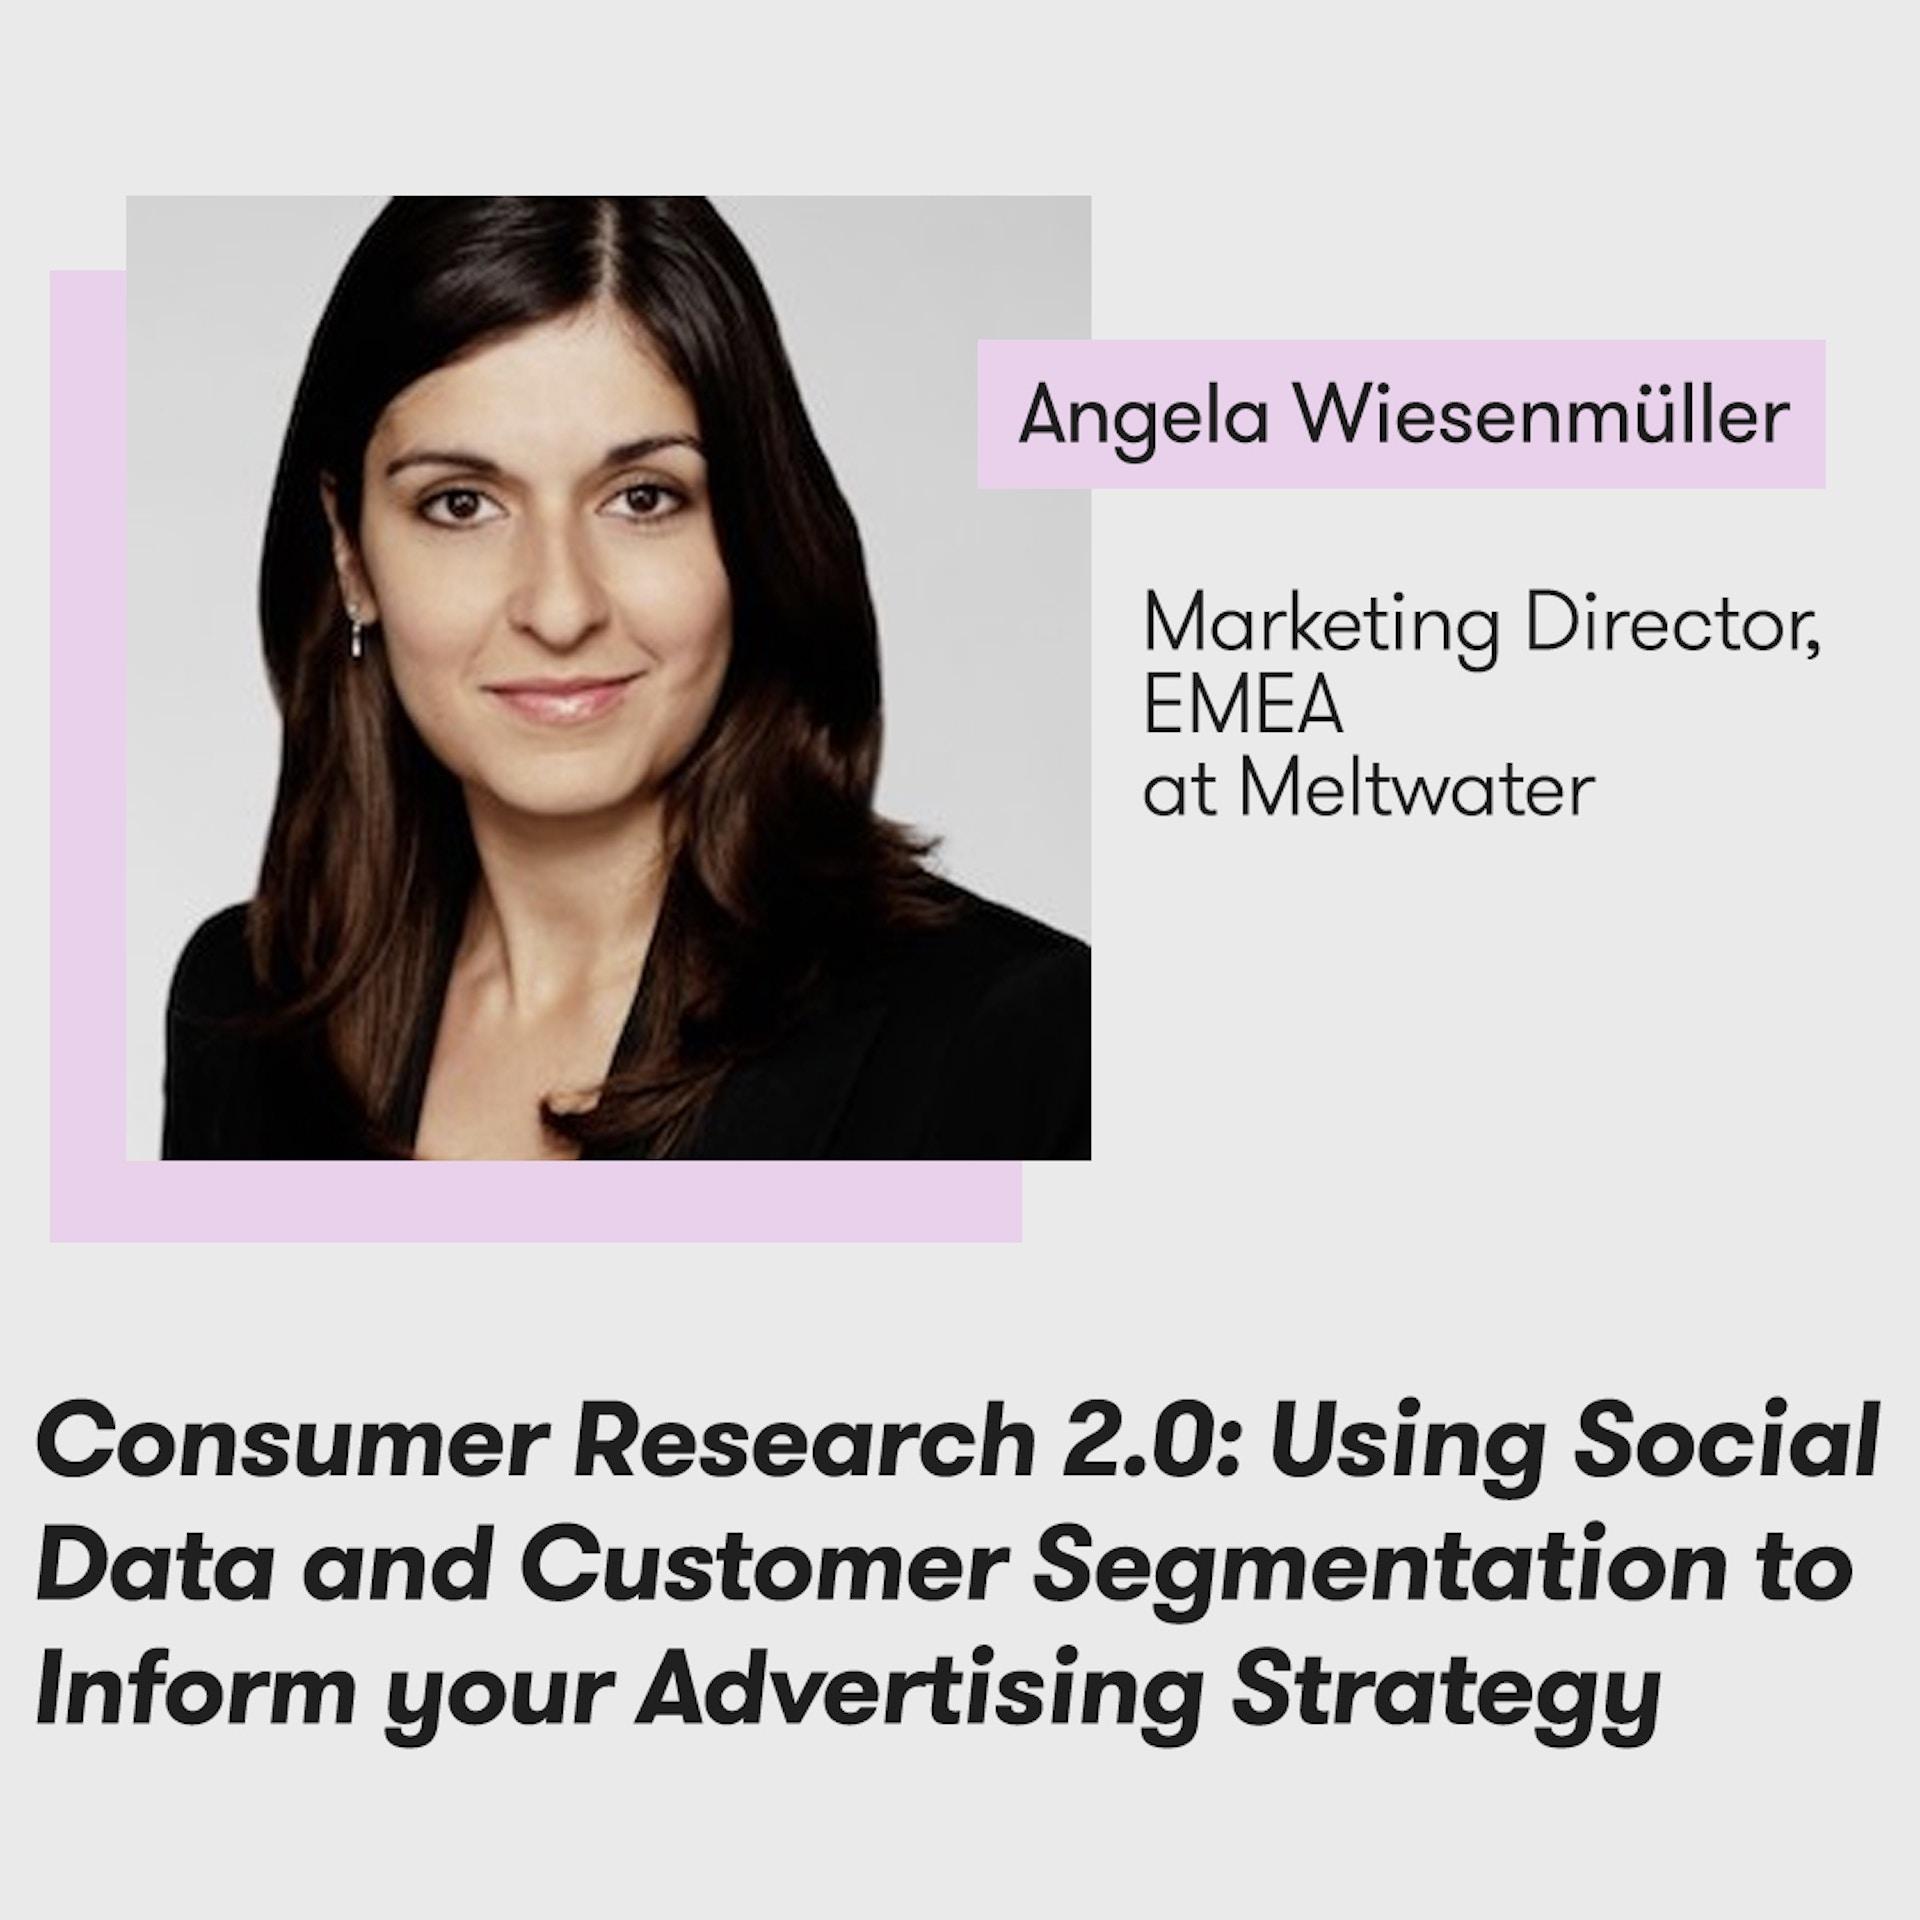 Meltwater Digital Summit - The Future of PR, Marketing and Tech - Angela Wiesenmüller